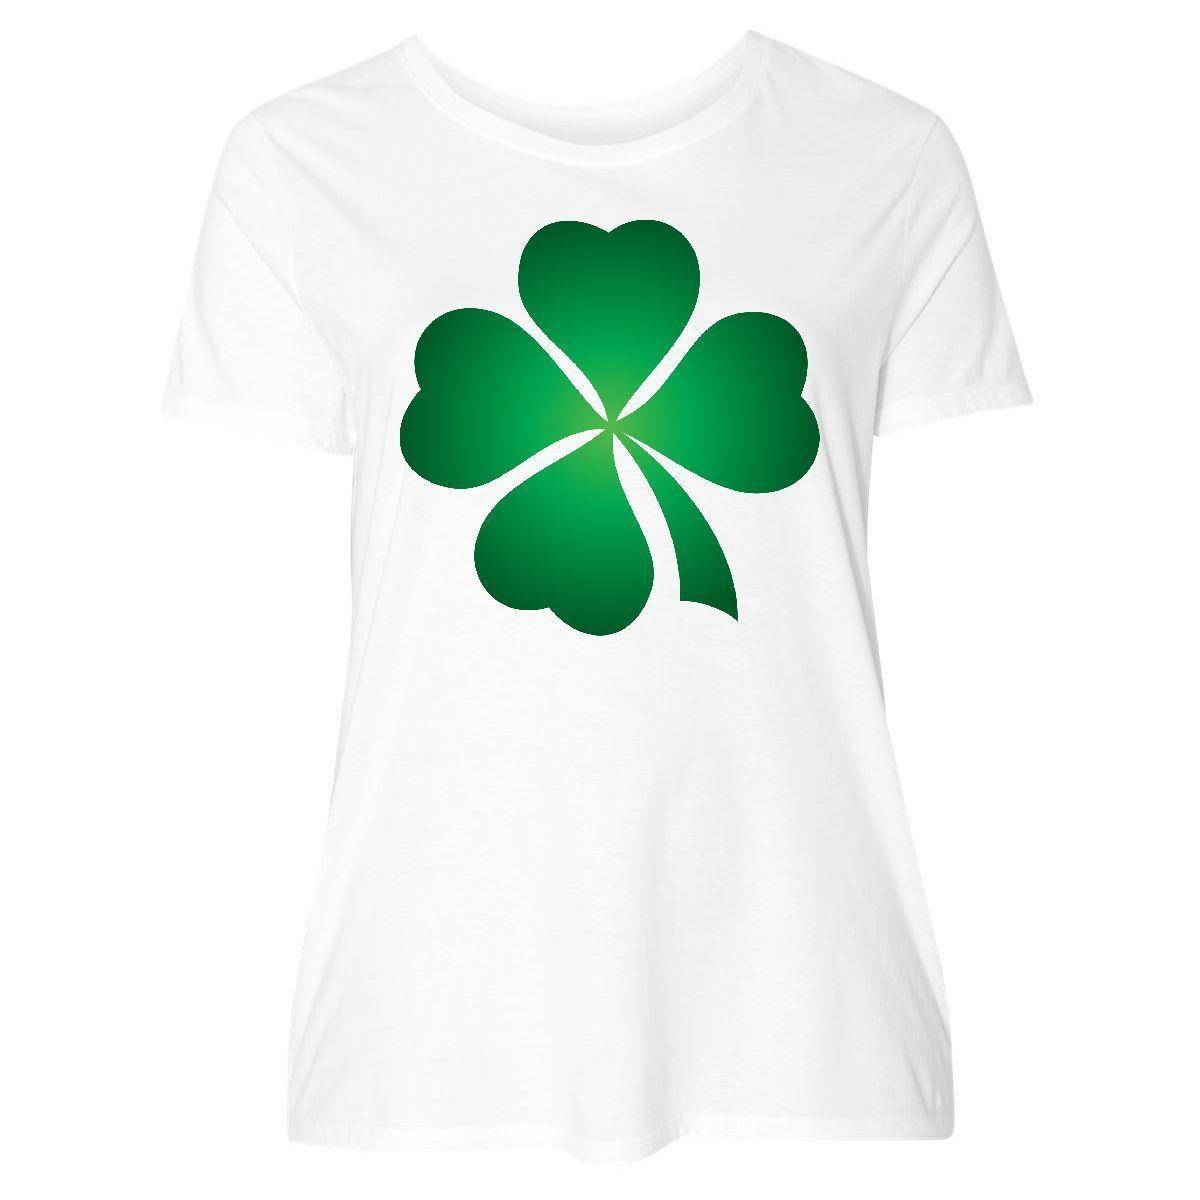 661b2376c Inktastic Irish St Patricks Day Green Clover Women's Plus Size T-Shirt  Ireland 4Funny free shipping Unisex Casual Tshirt